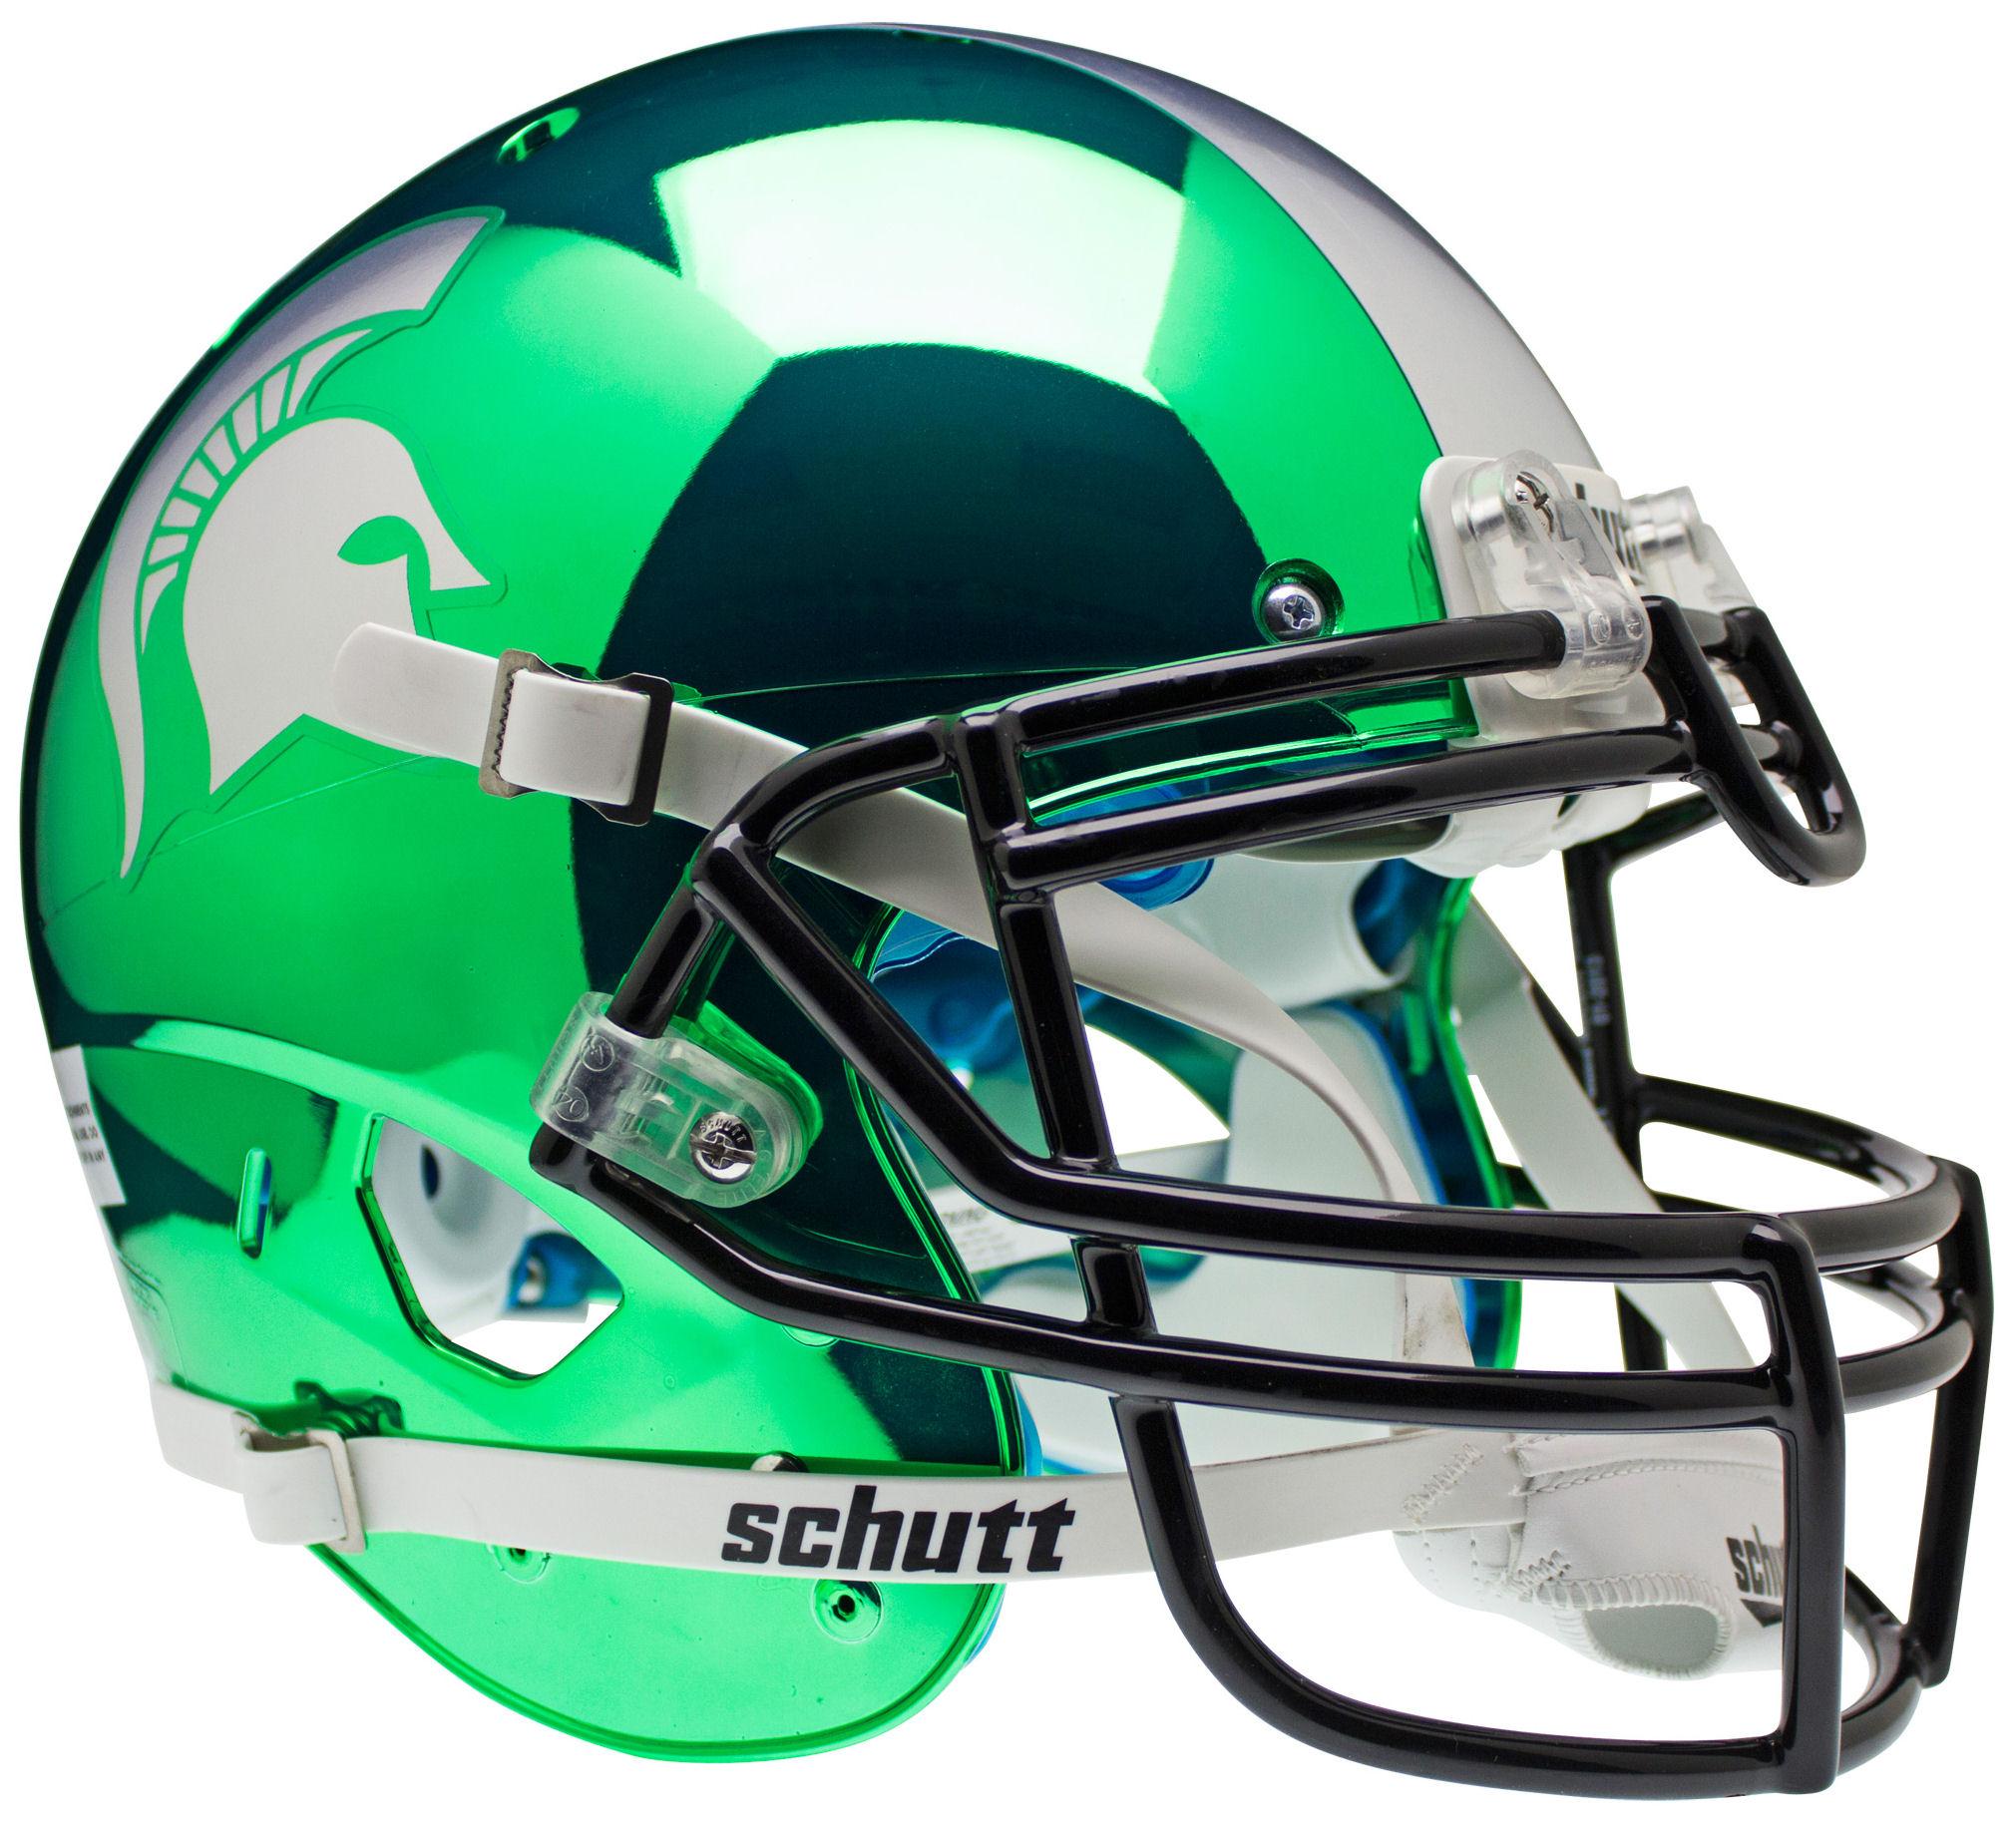 Michigan State Spartans Authentic College Xp Football Helmet Schutt Chrome Football Helmets College Football Helmets Michigan State Spartans